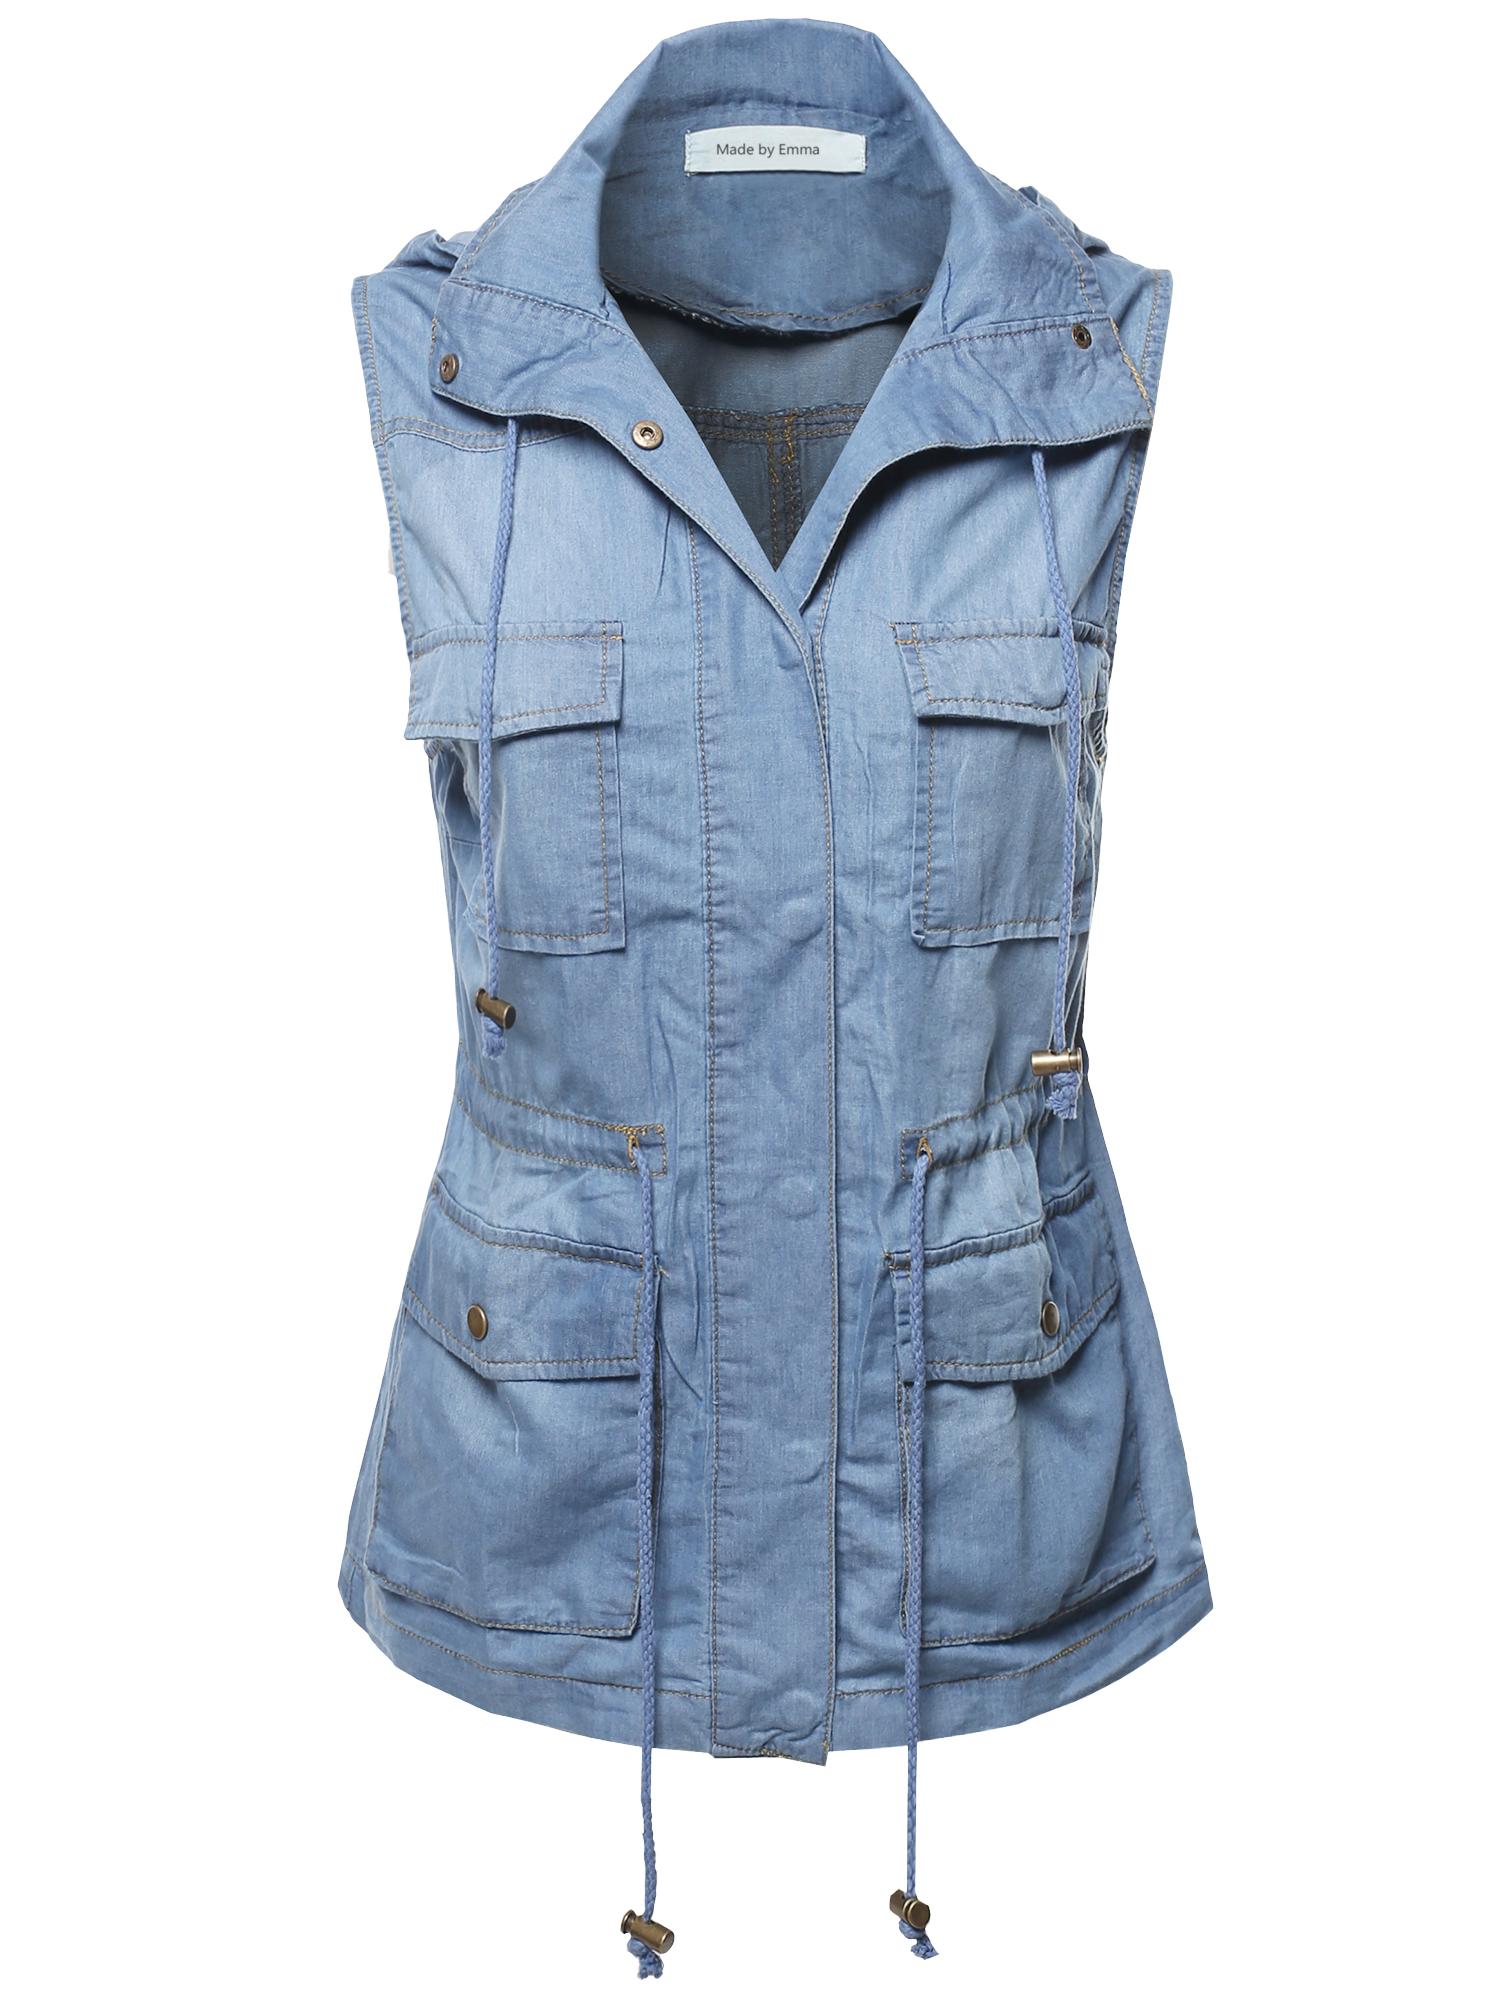 8f3df5075305a FashionOutfit Women s Casual Denim Sleeveless Military Safari Utility  Drawstring Hoodie Vest